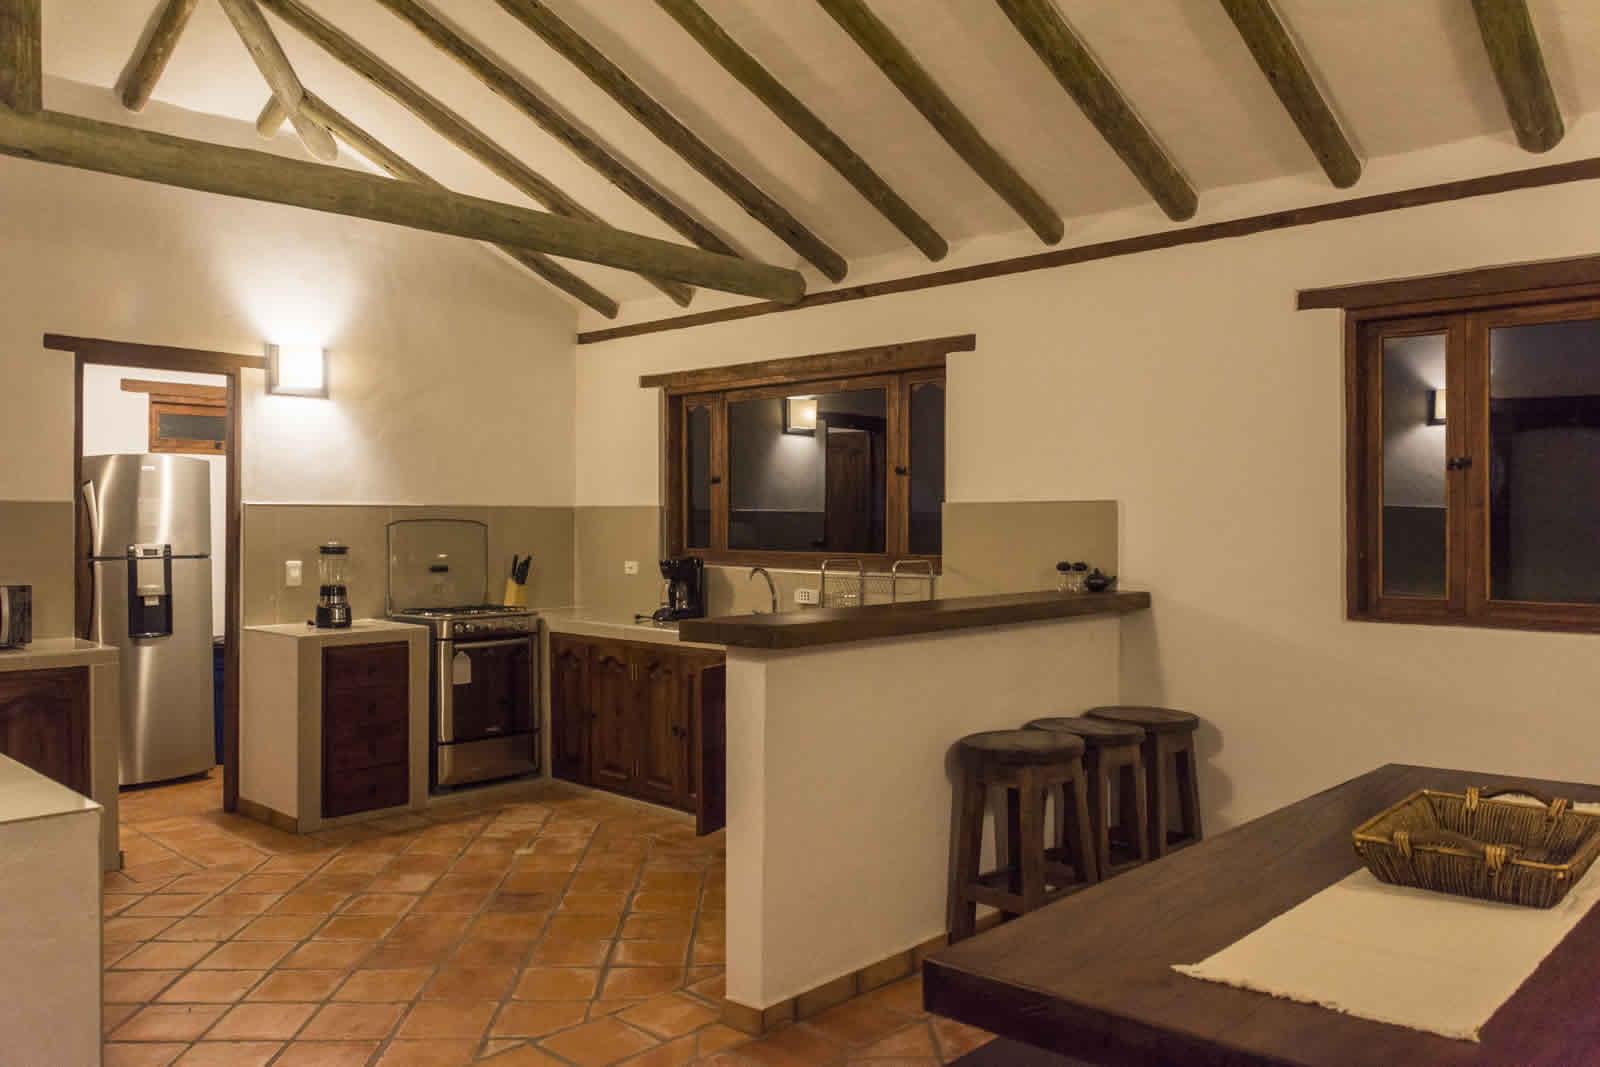 Alquiler casa de Ritoque en Villa de Leyva - Cocina